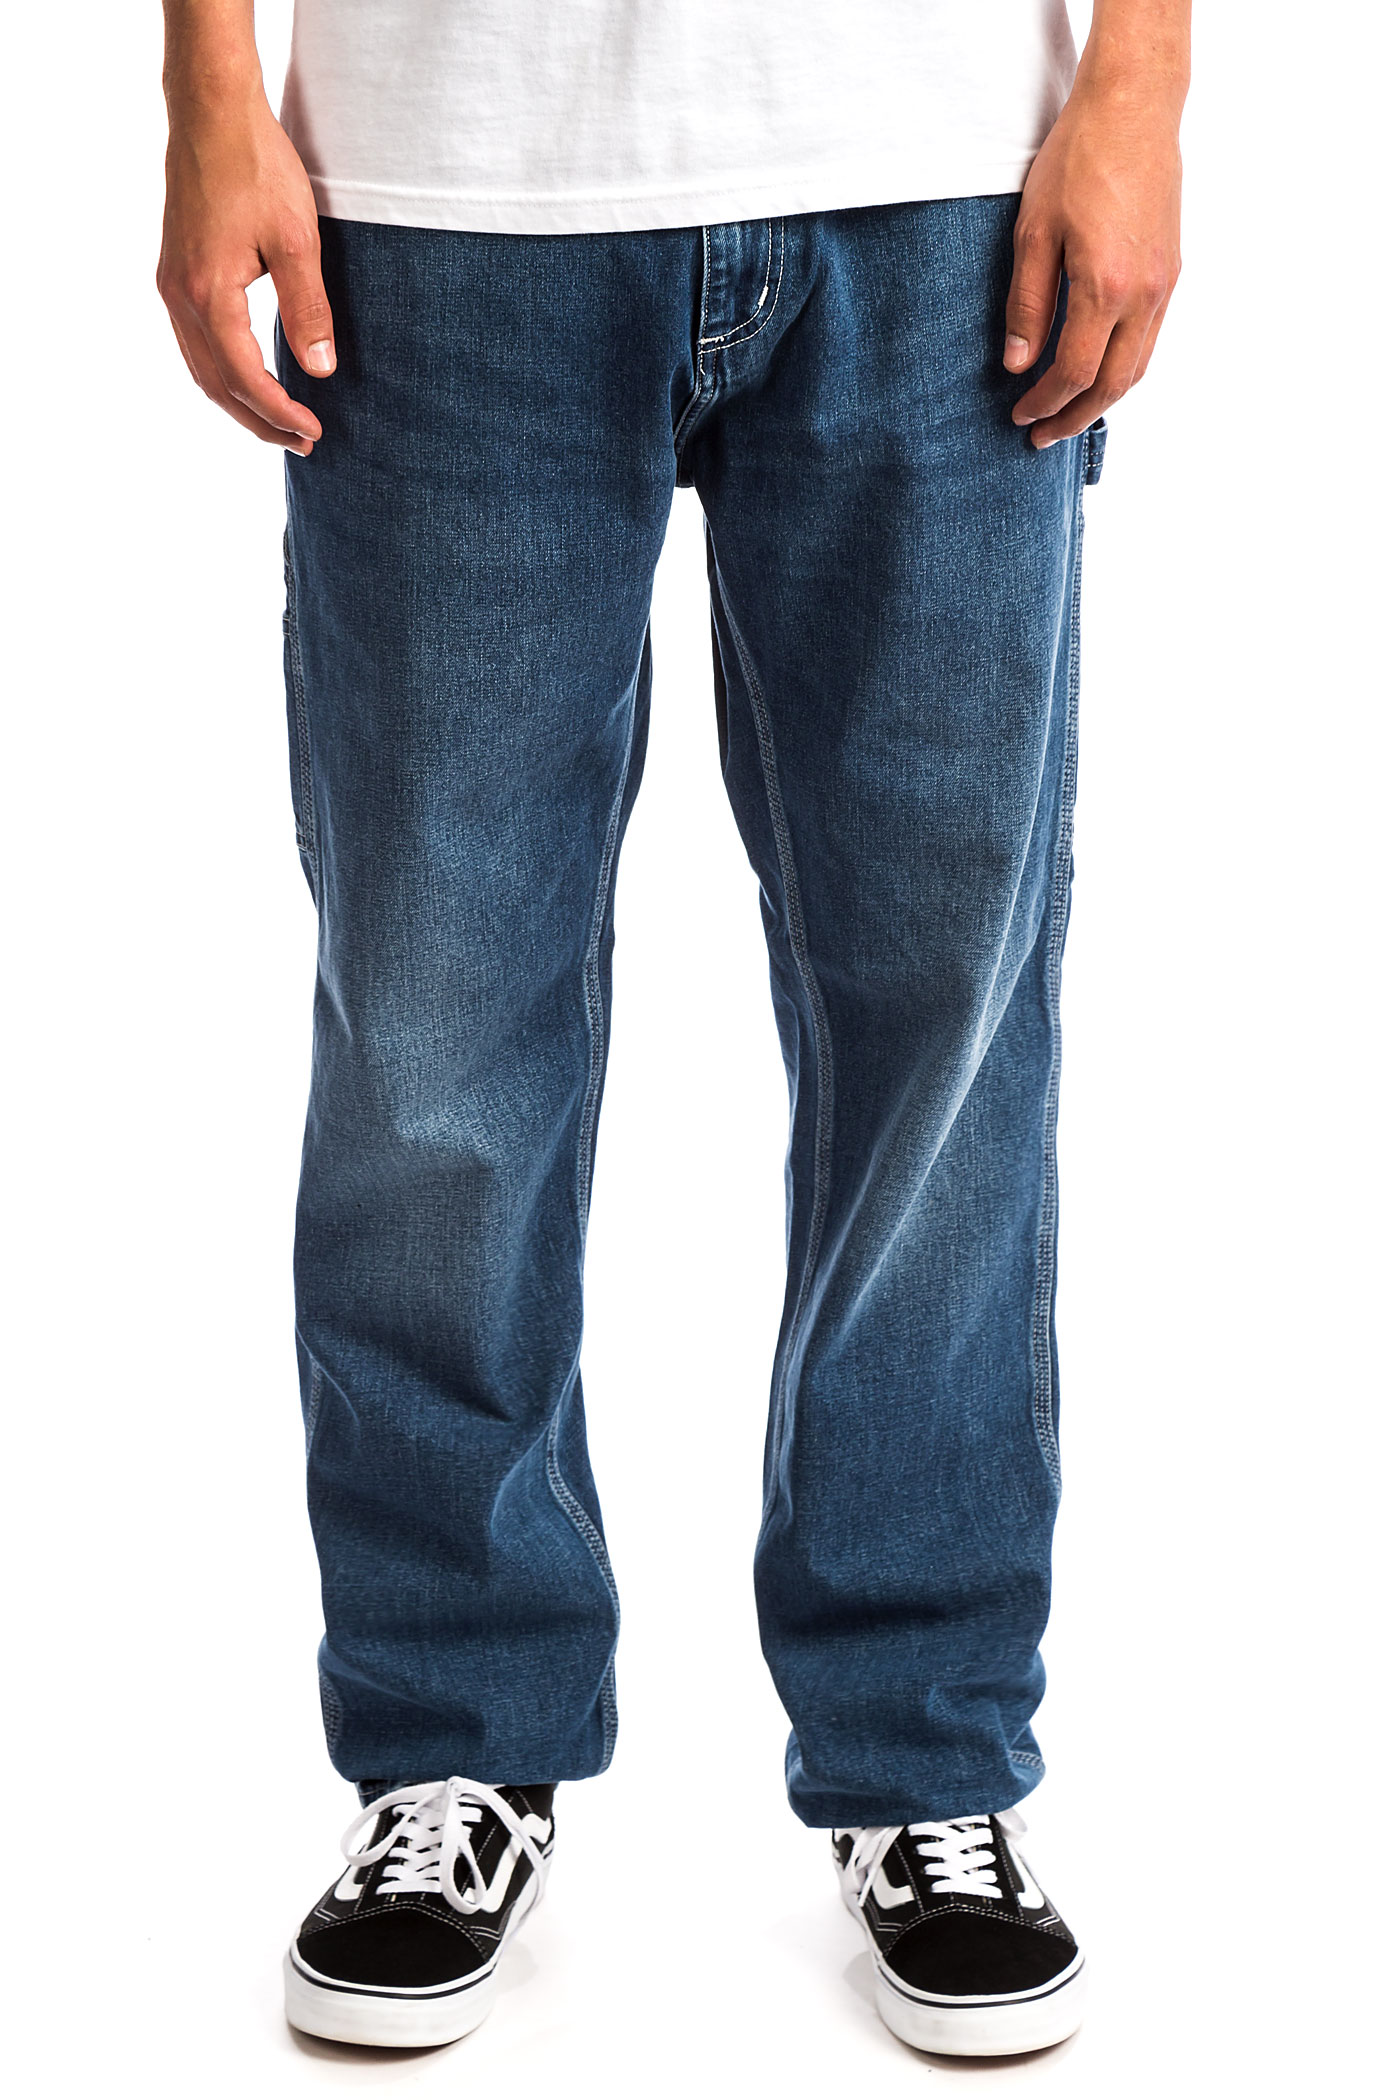 Knee Dark True Carhartt Norco Stone Pant Jeansblue Single Wip Ruck OPn08NwkXZ